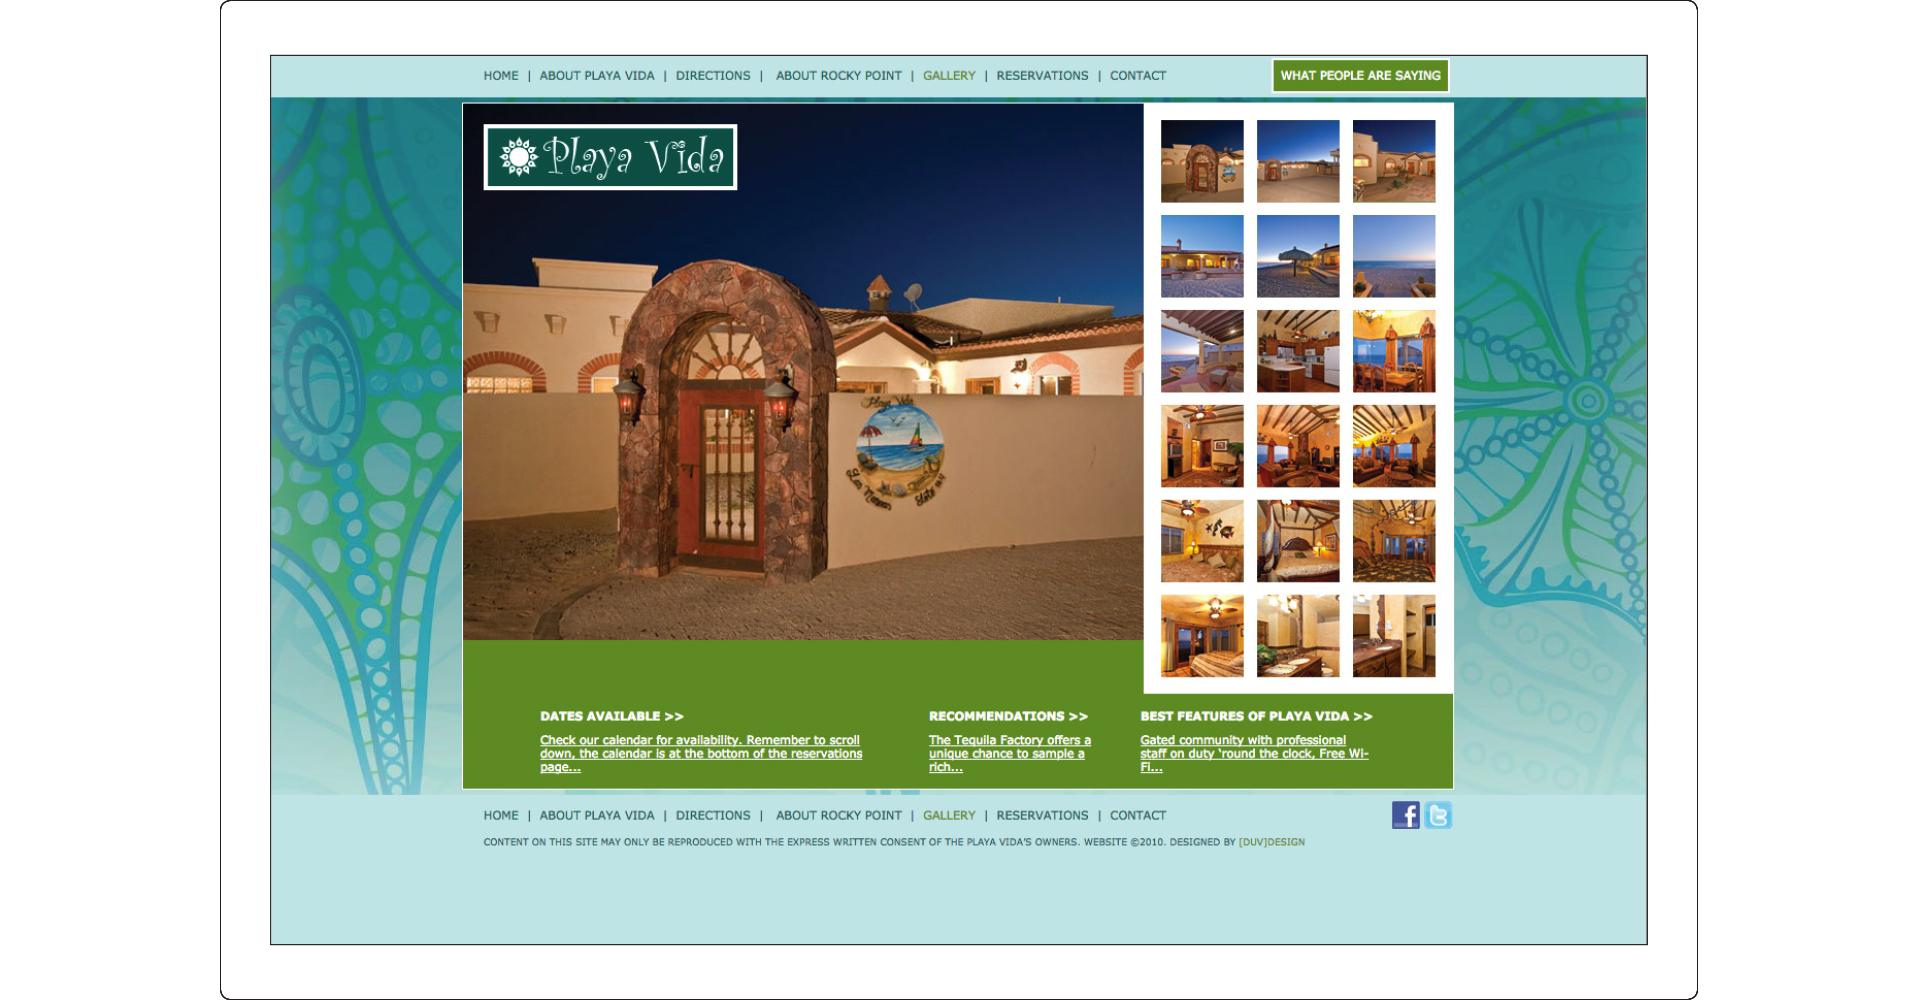 Web Design Playa Vida